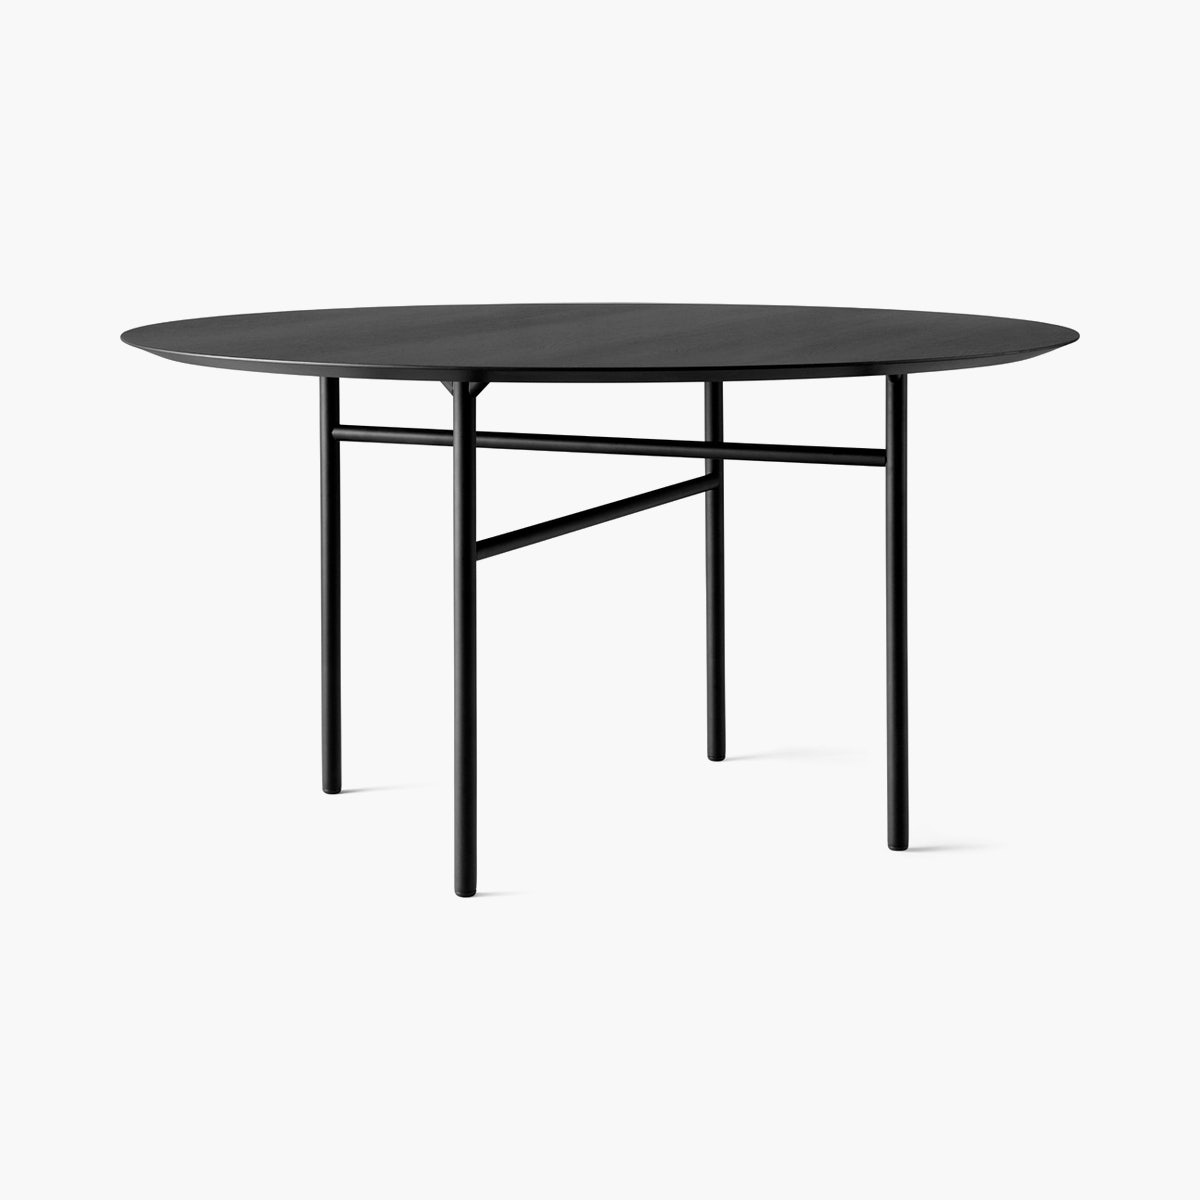 Snaregade Table, Round